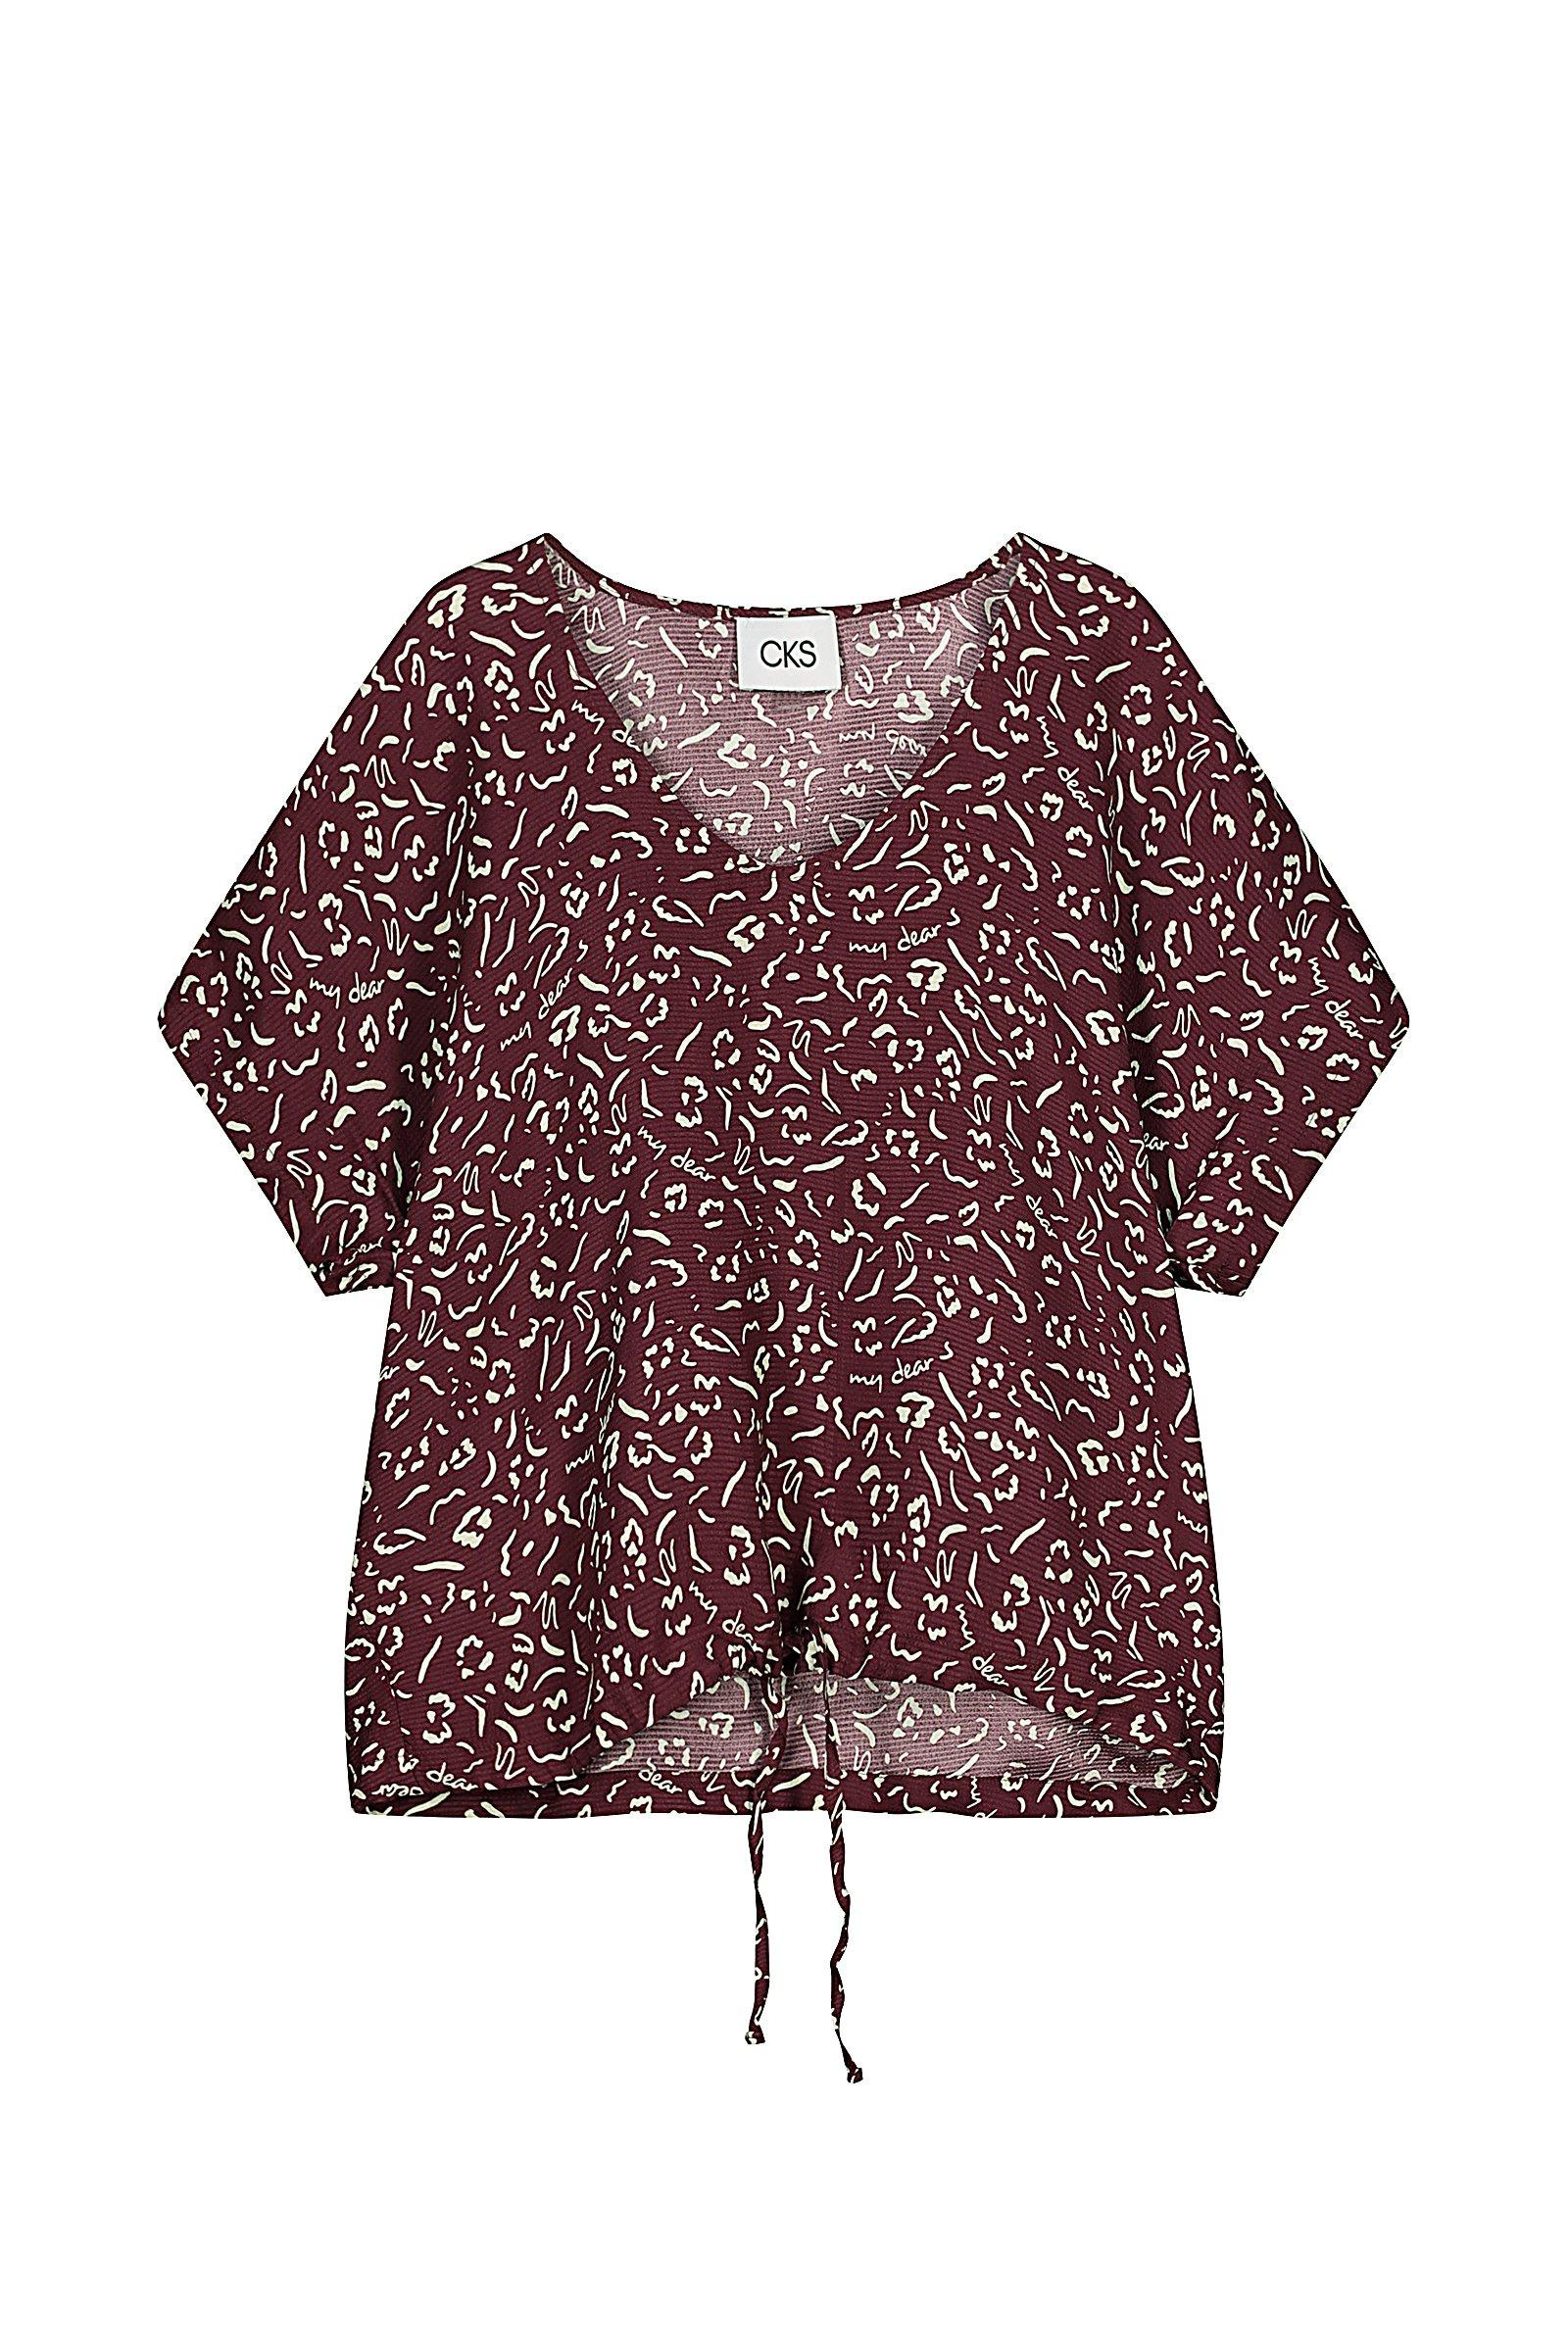 https://webmedia.cks-fashion.com/i/cks/123255ASM_50_l